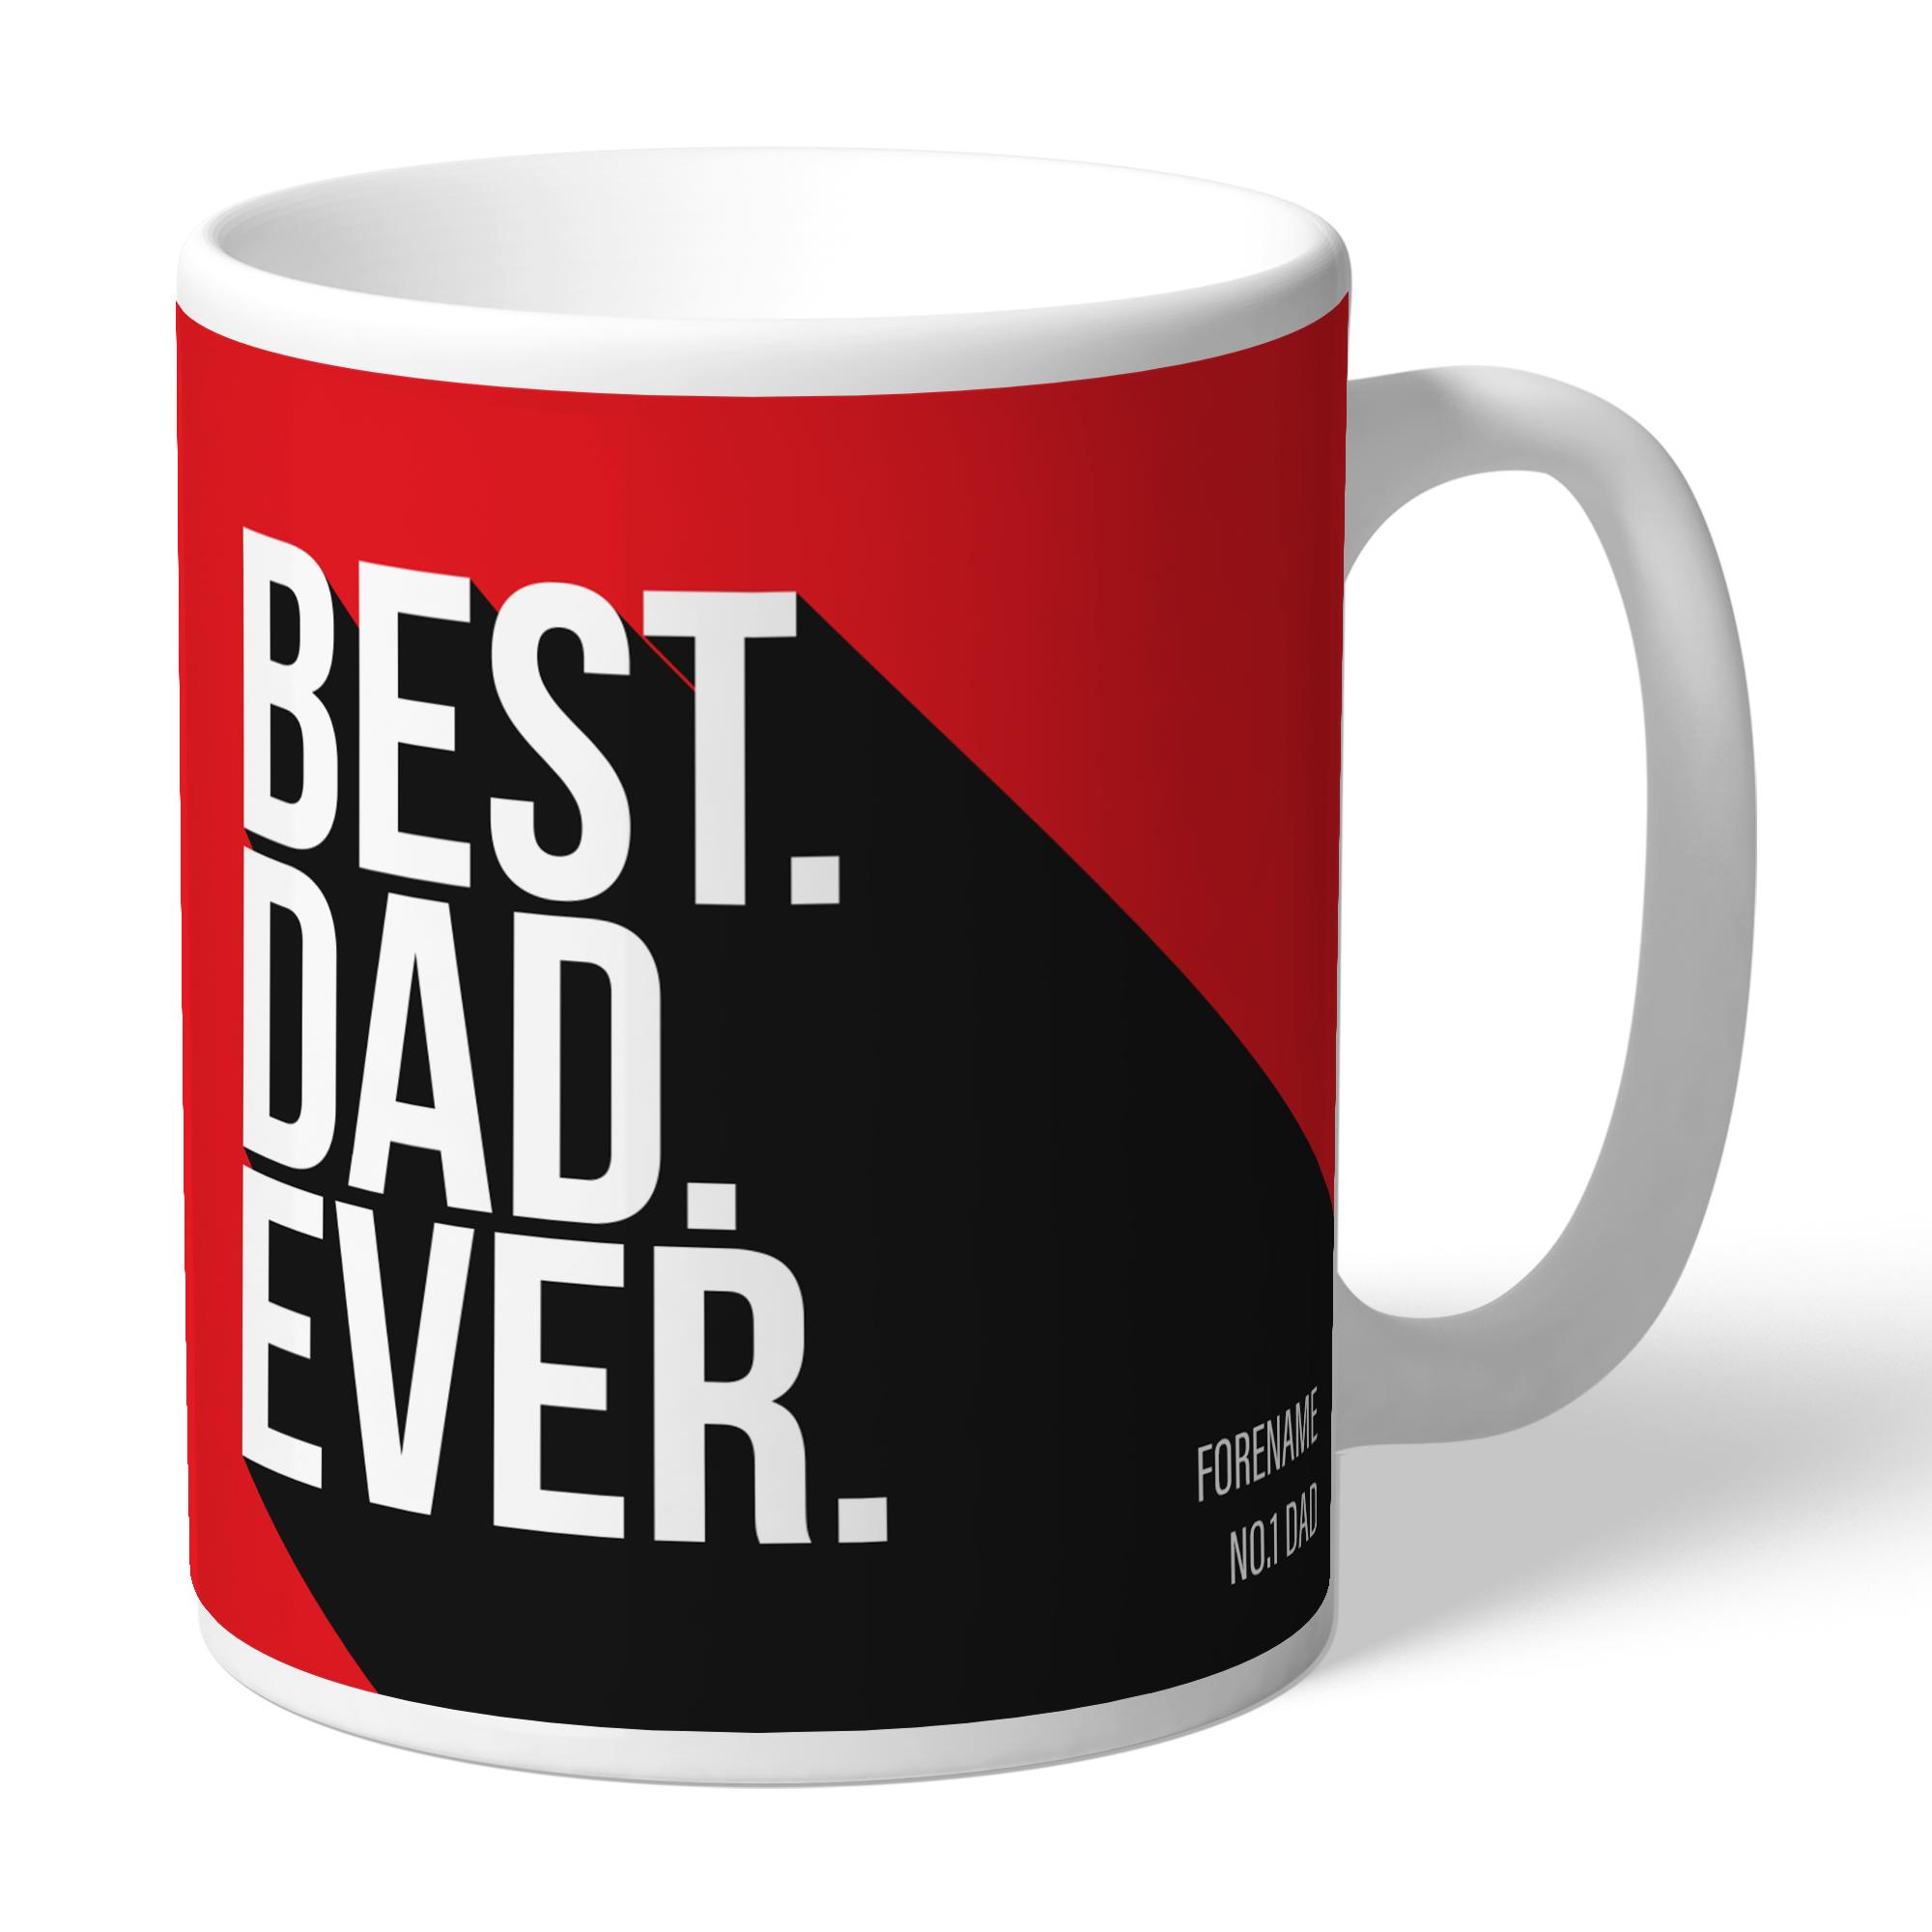 Liverpool FC Best Dad Ever Mug